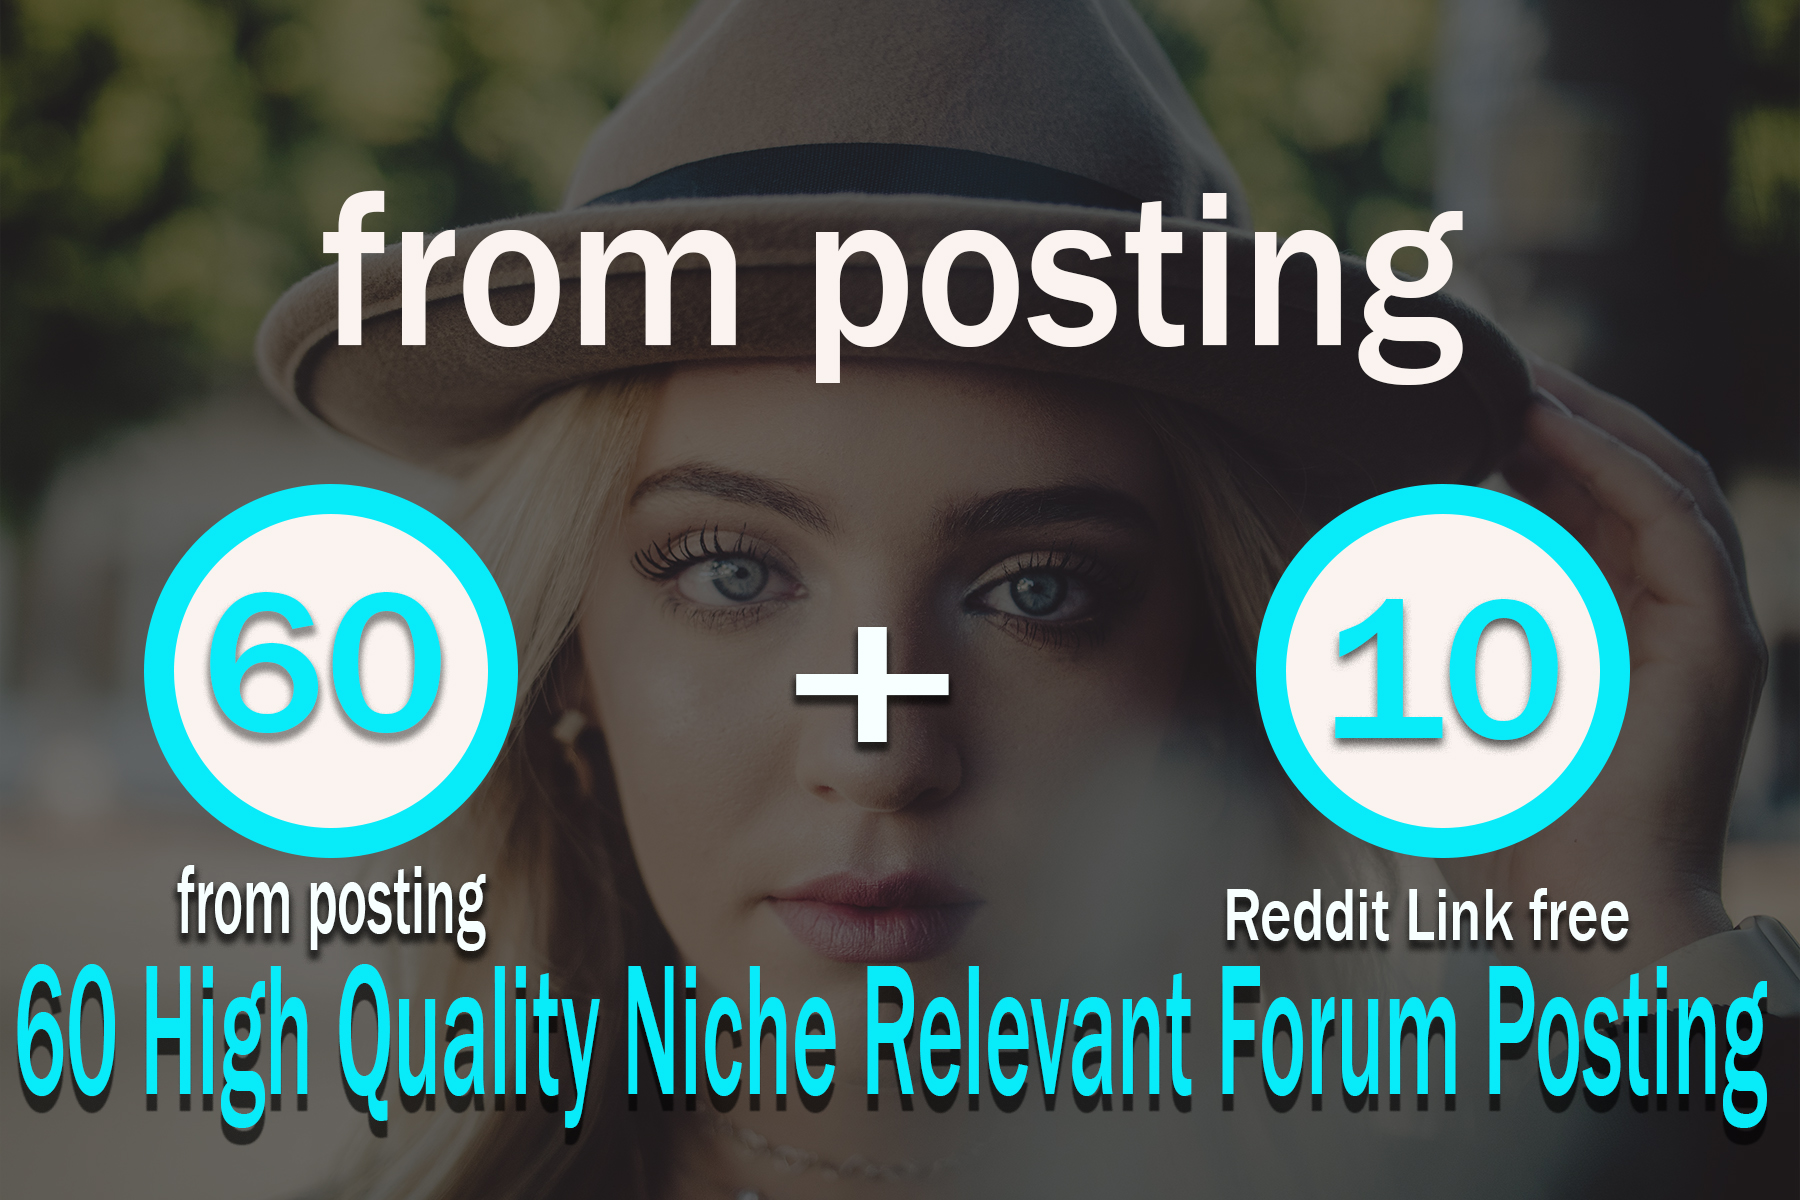 60 High Quality Niche Relevant Forum Posting